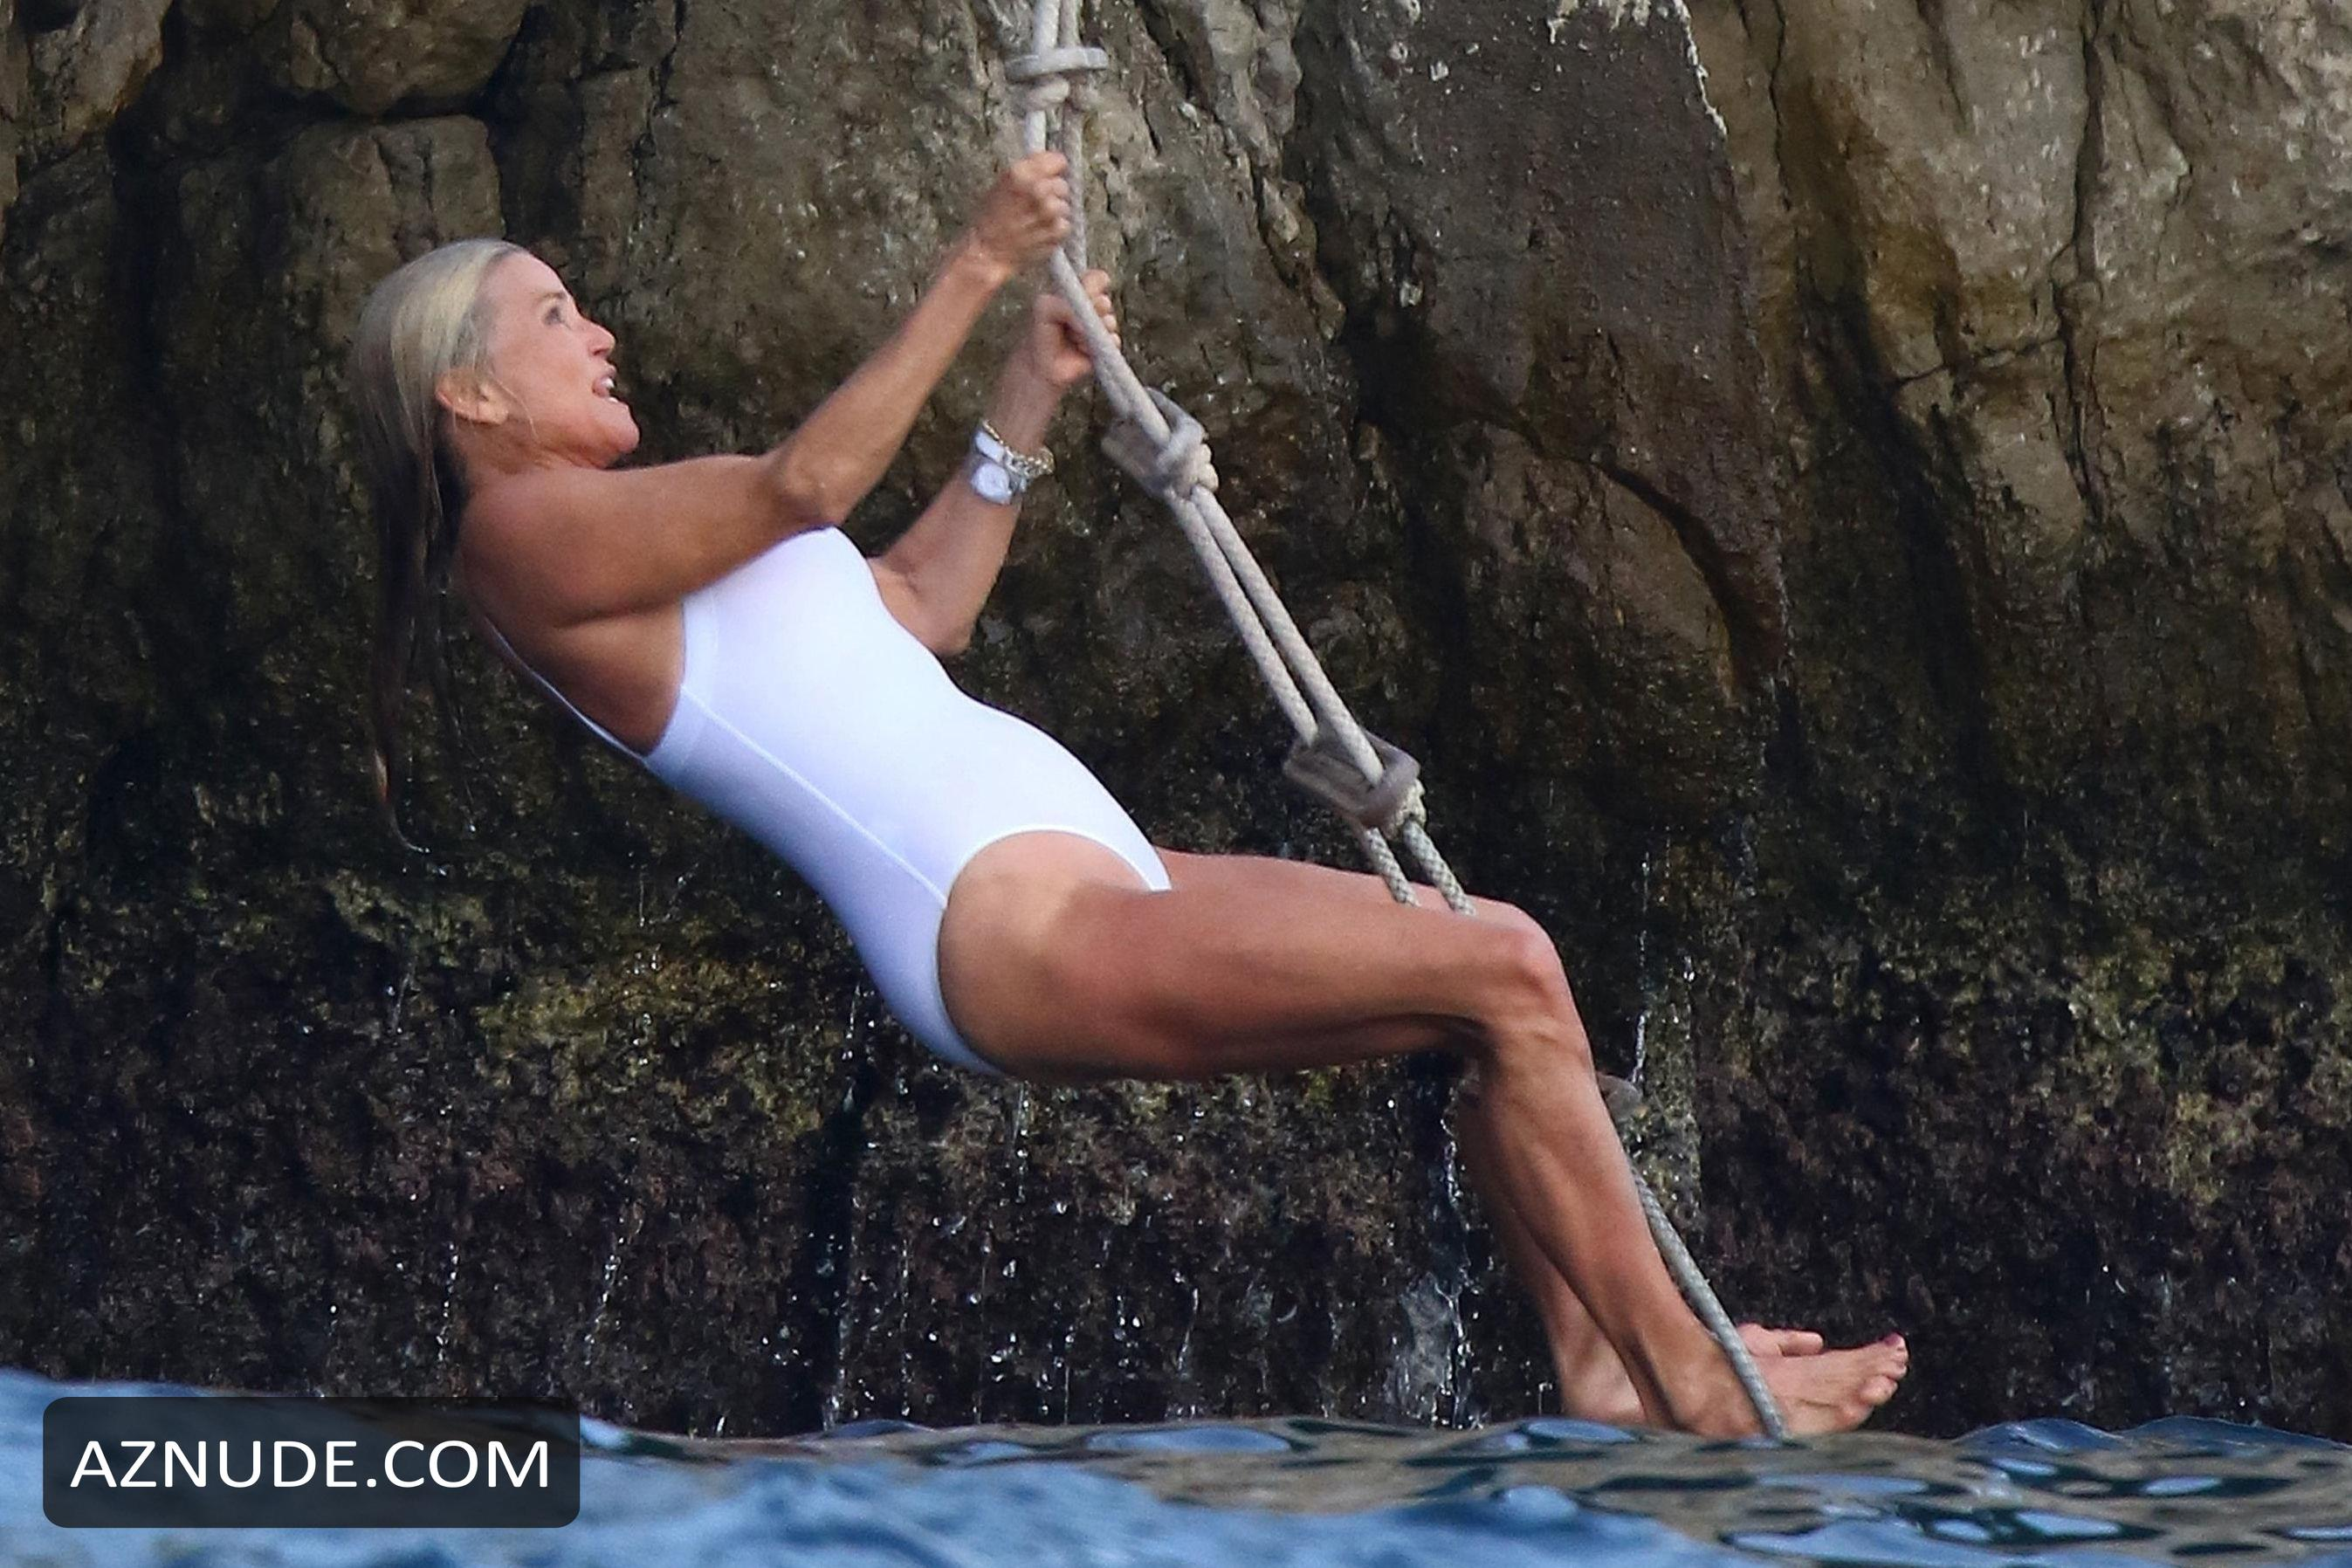 Christie Brinkley Hot Photos Enjoying The Beach With Her -9473